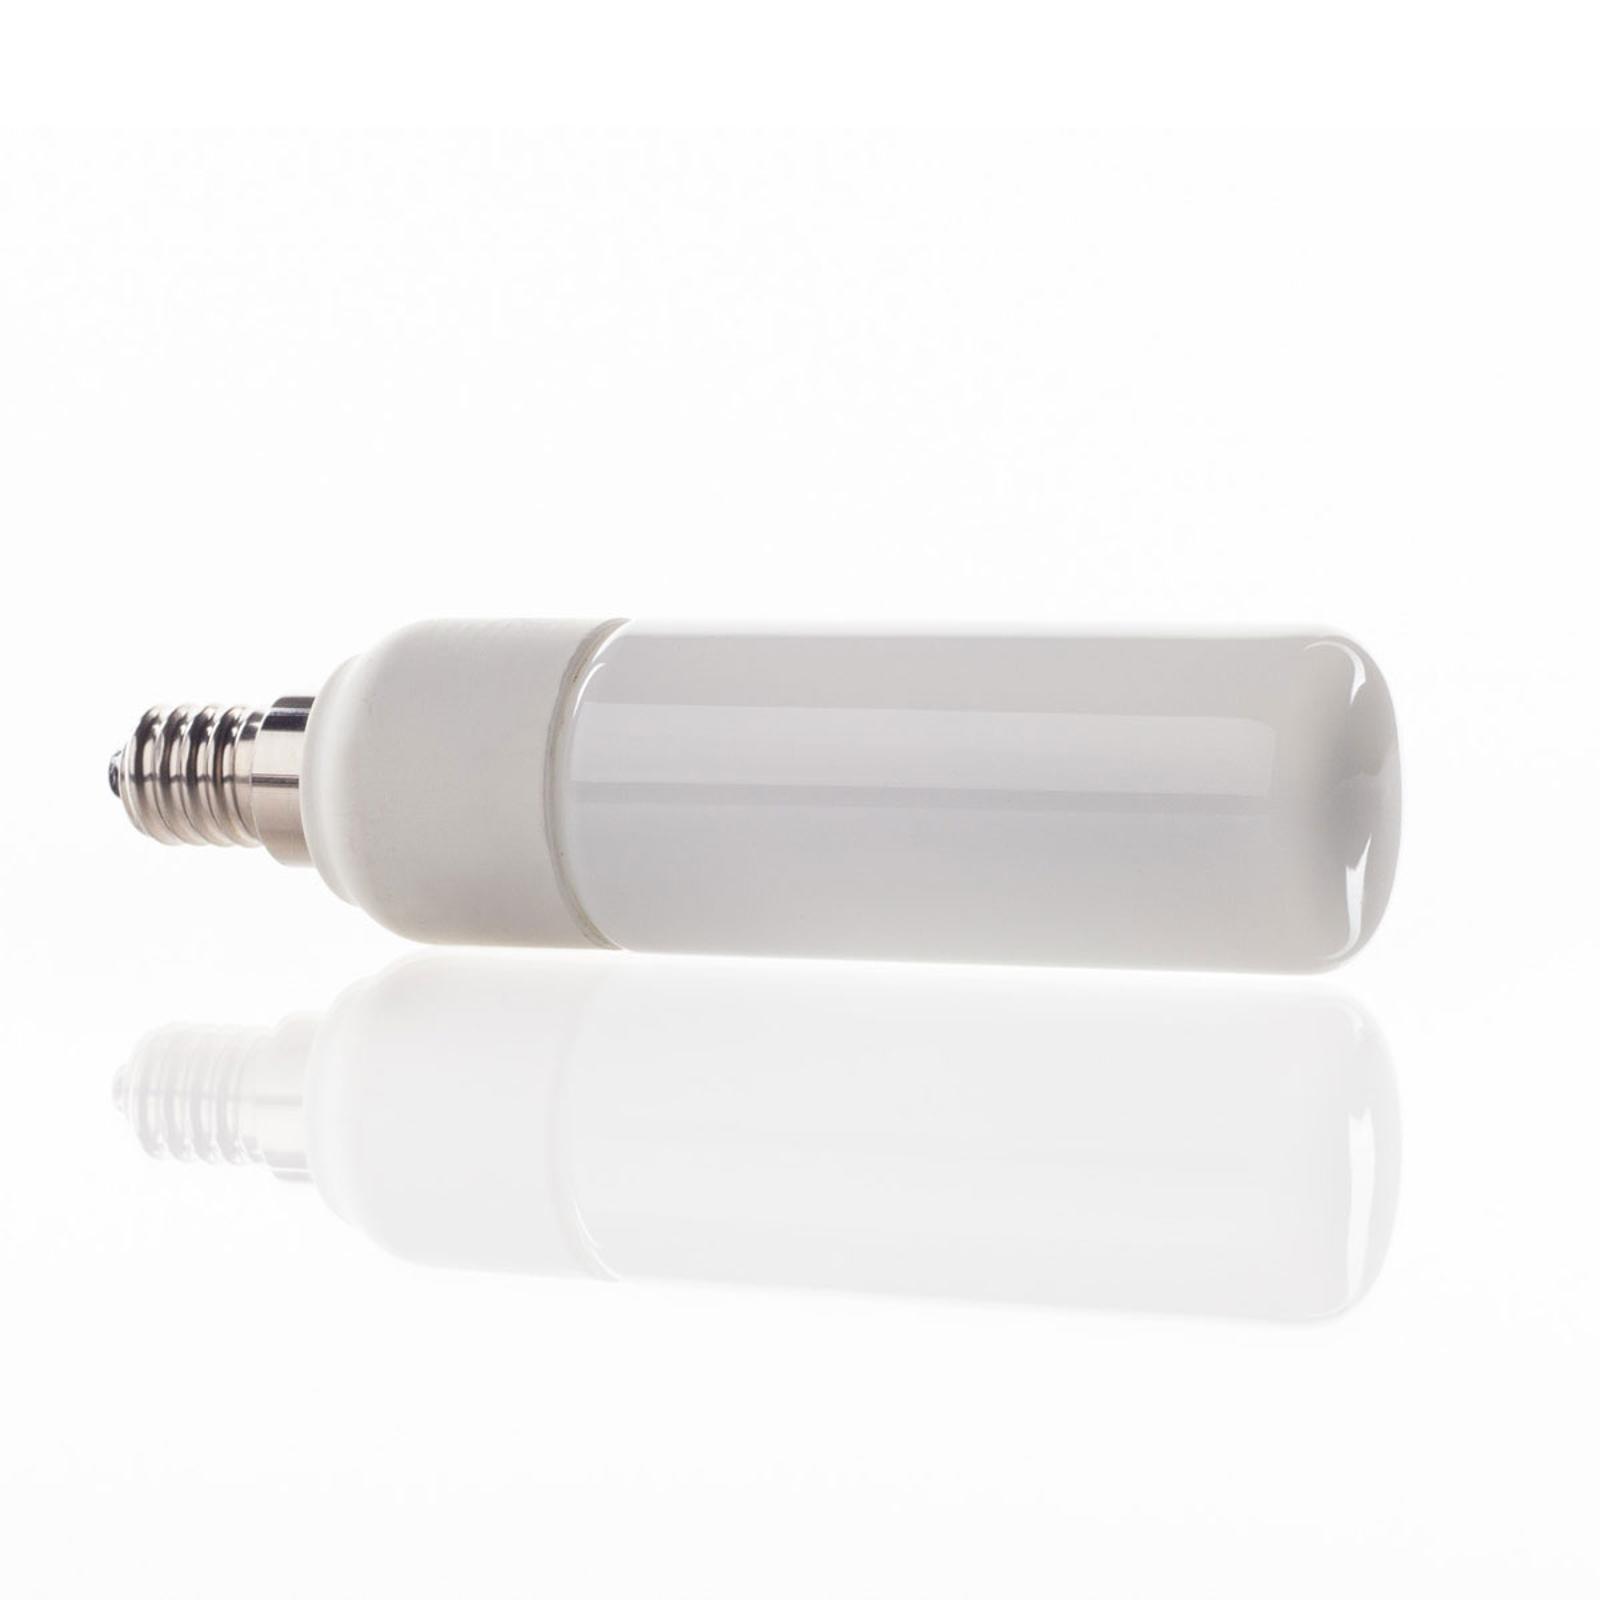 E14 5W LED-lampa i rörform